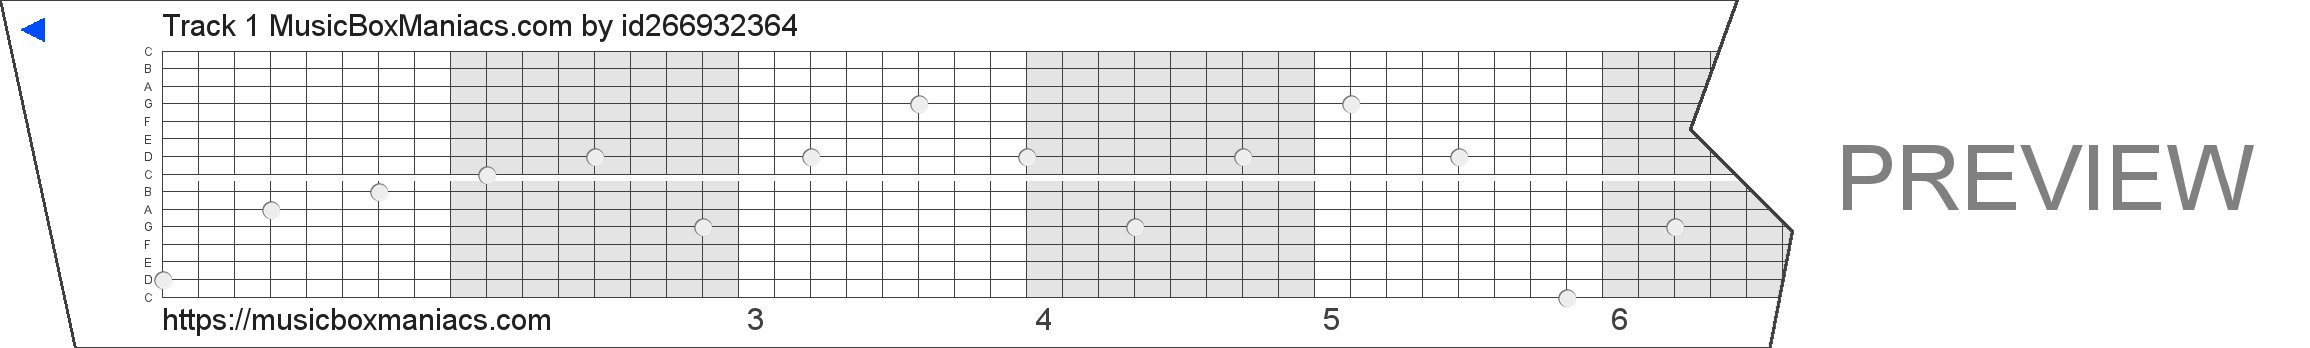 Track 1 MusicBoxManiacs.com 15 note music box paper strip